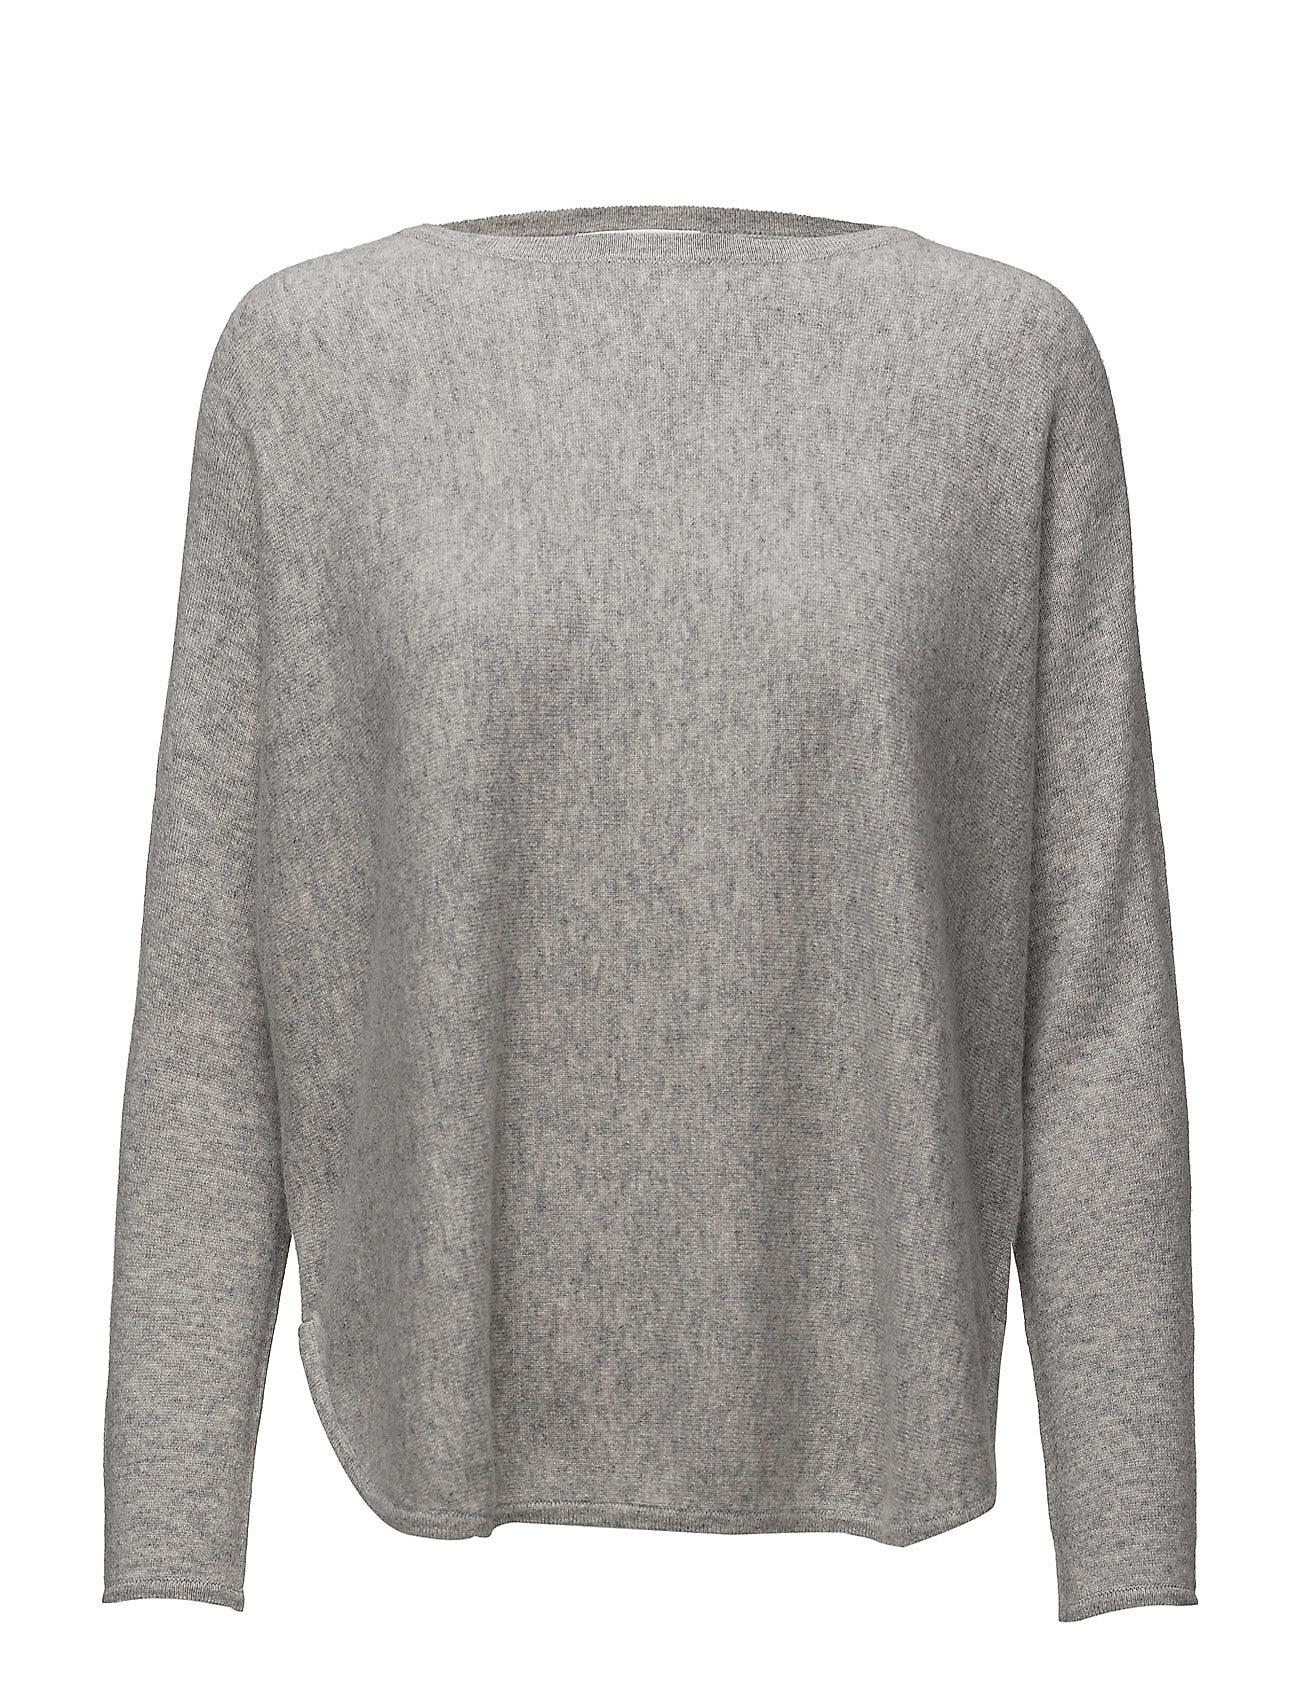 Davida Cashmere Curved Sweater - LIGHT GREY